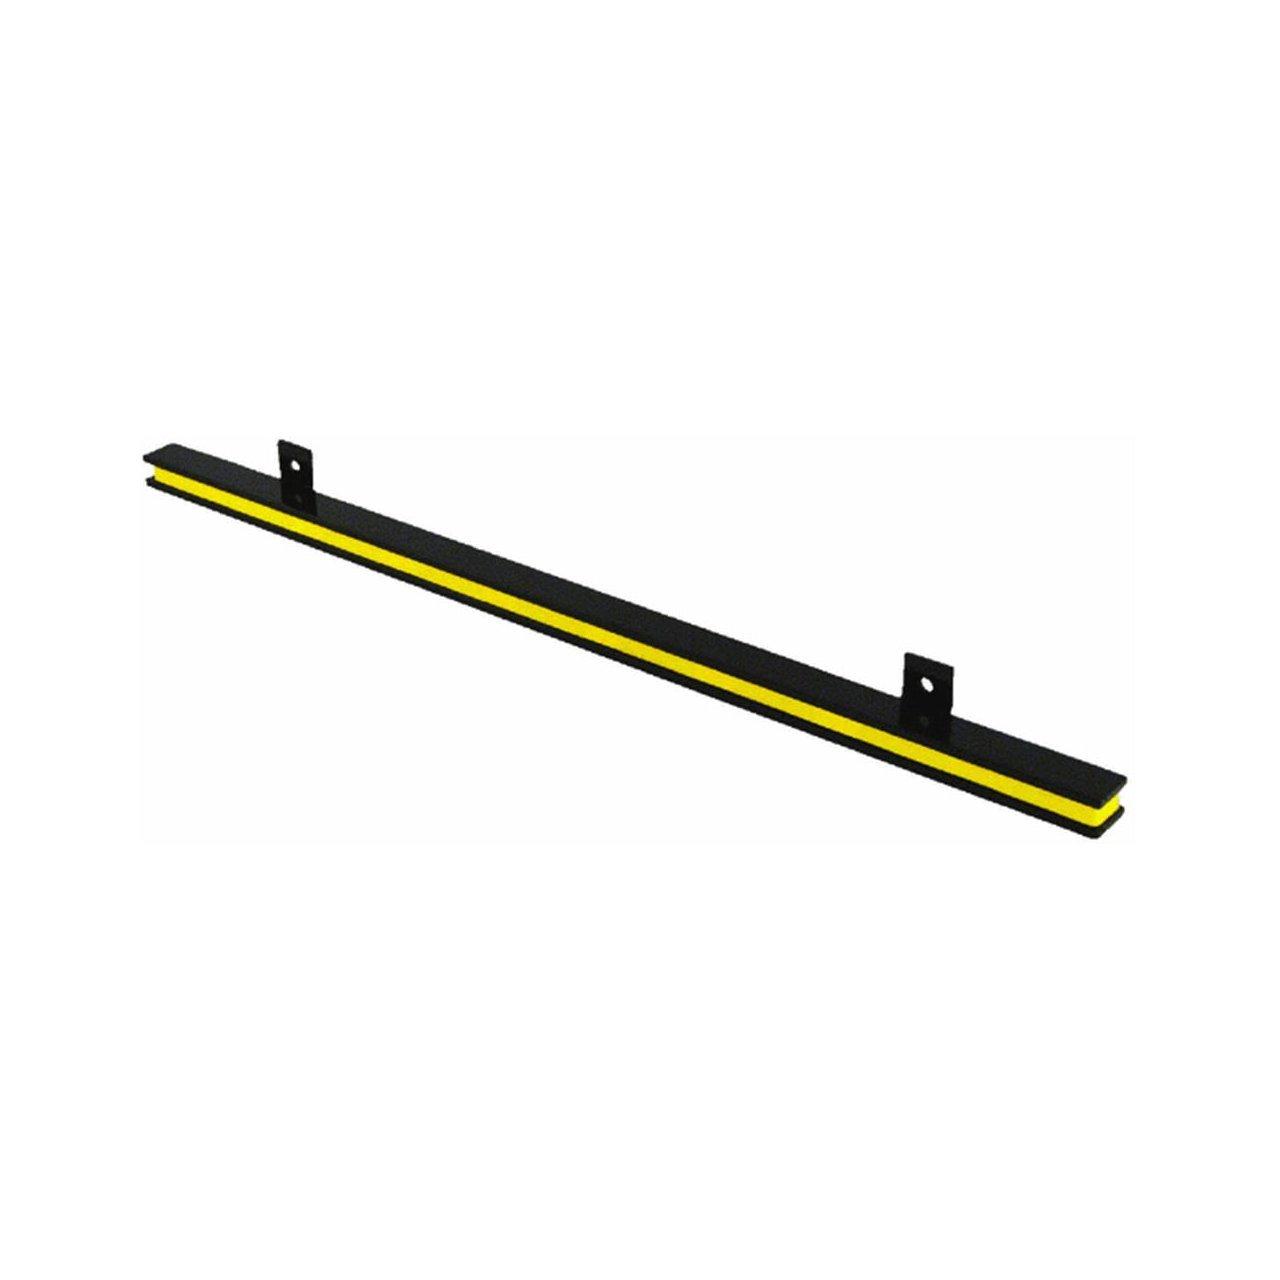 Magnetic bar